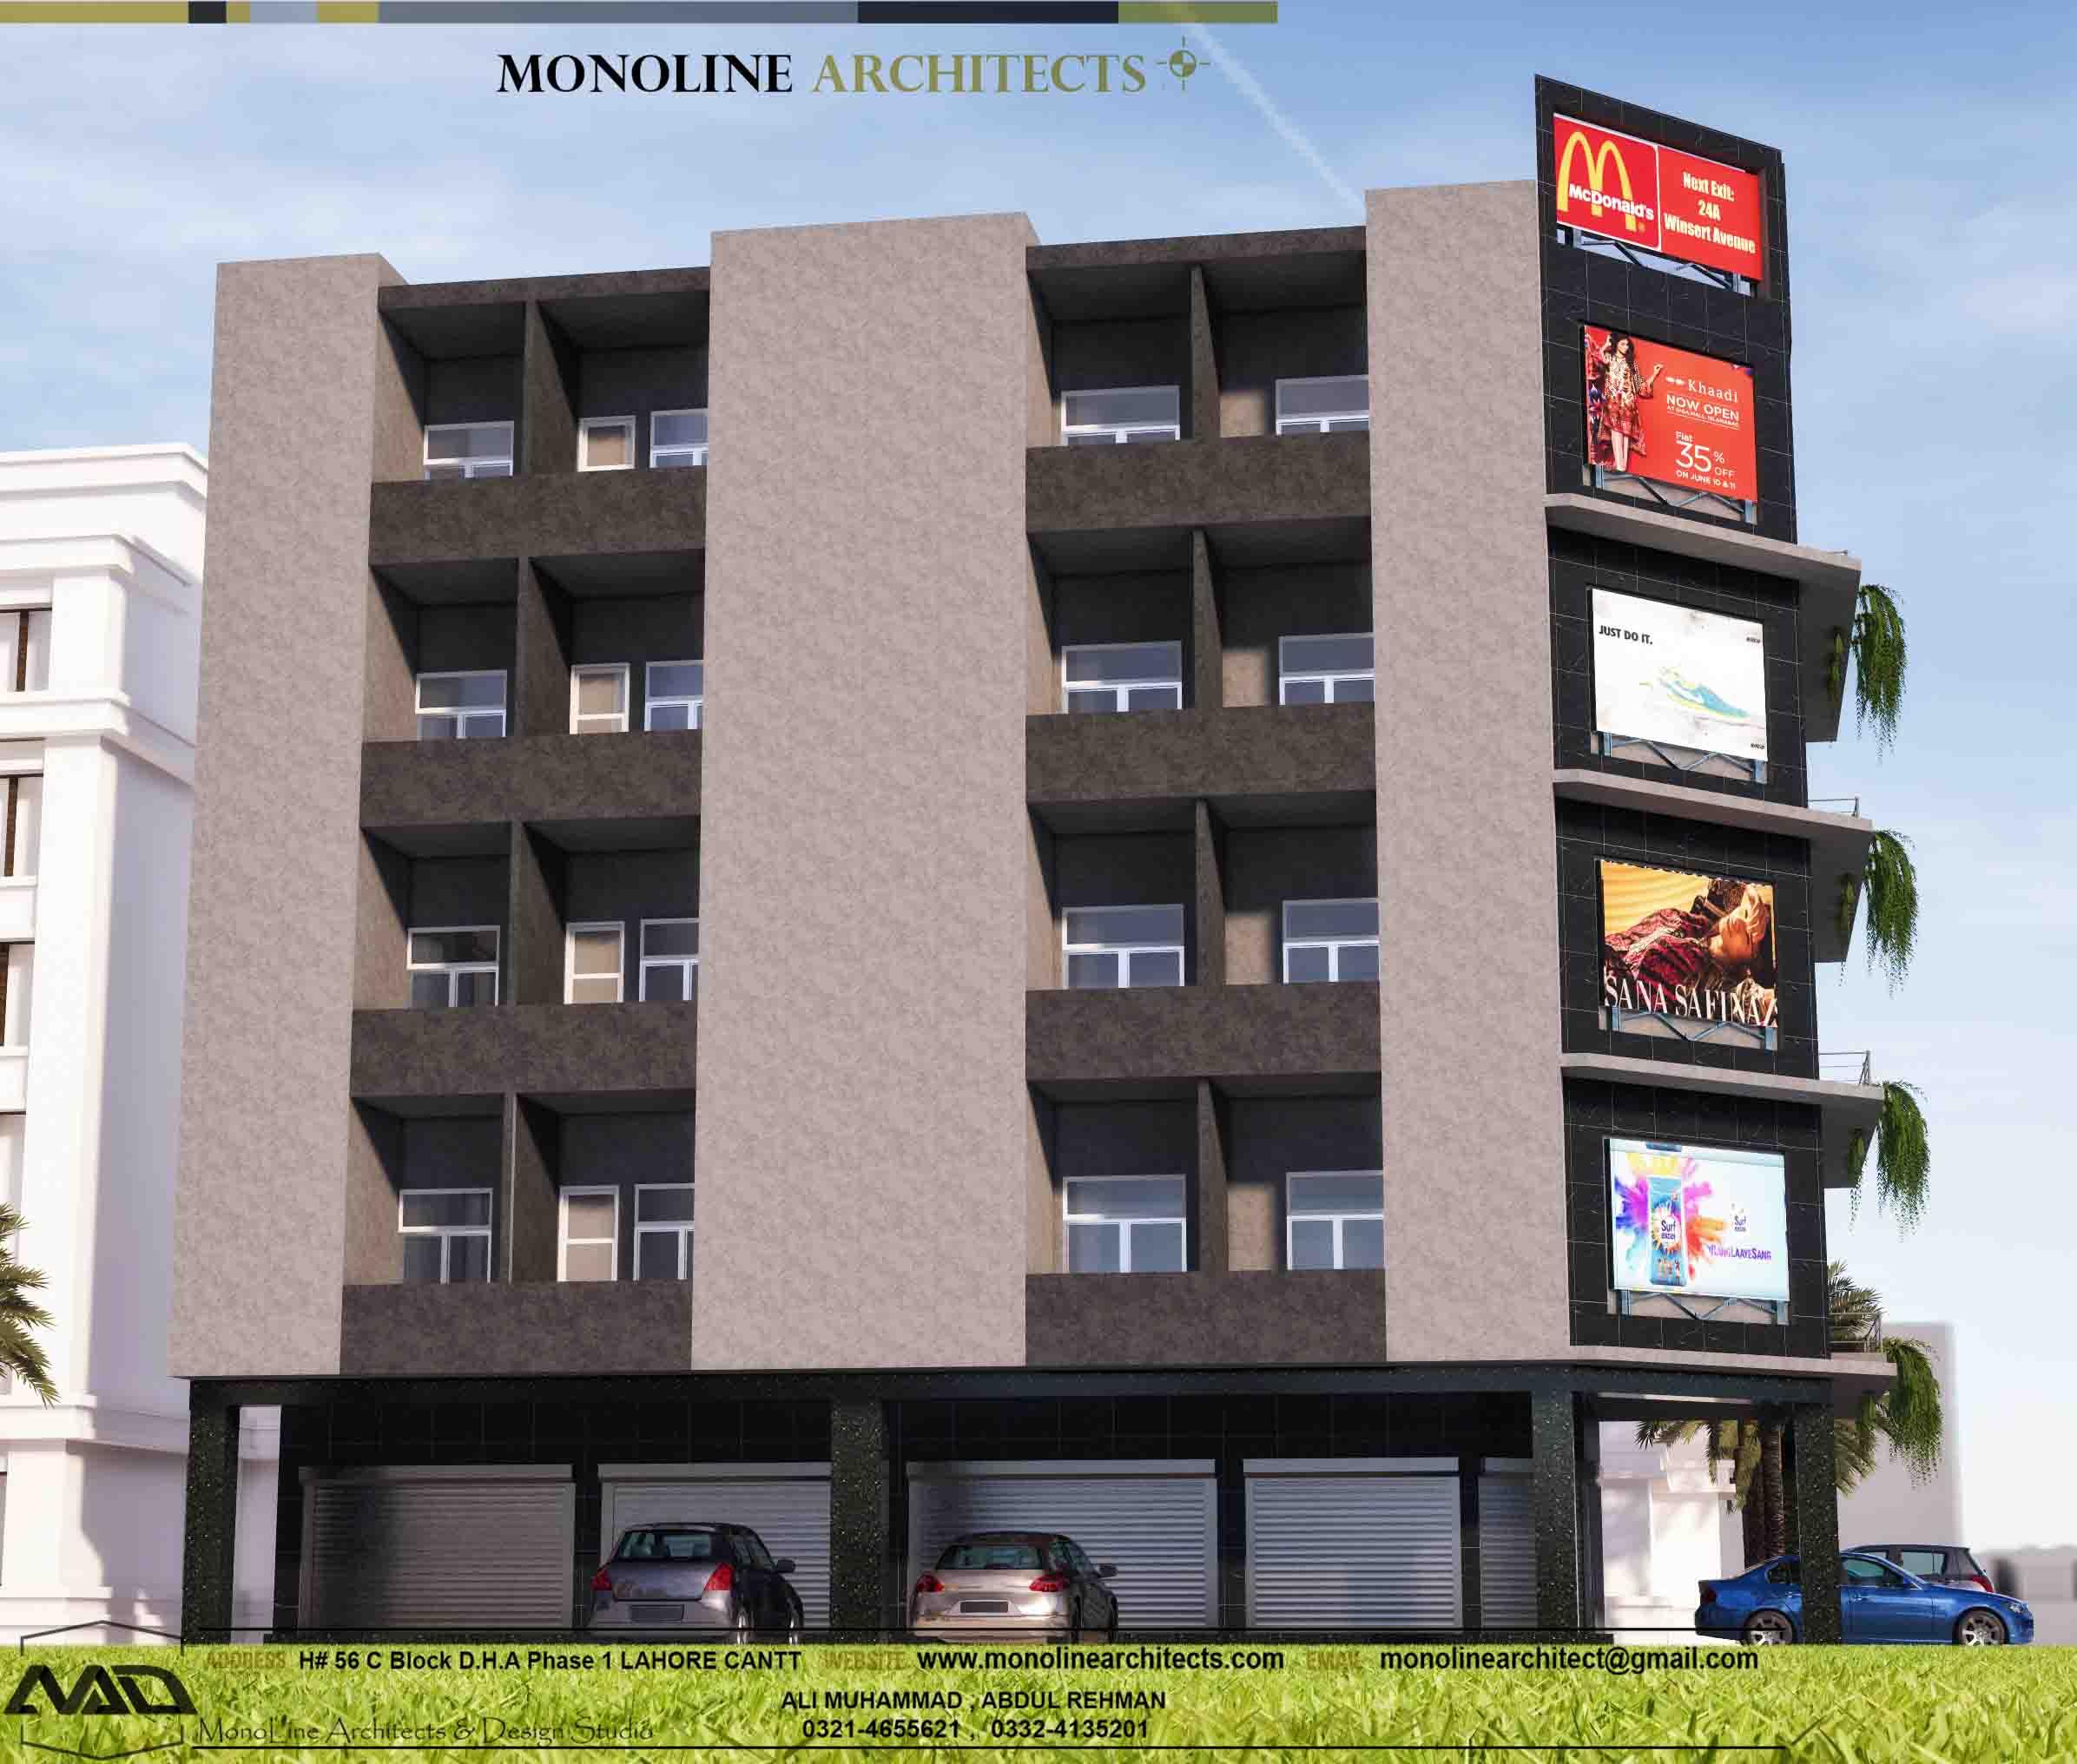 Wapda town plaza 3 by monoline architects